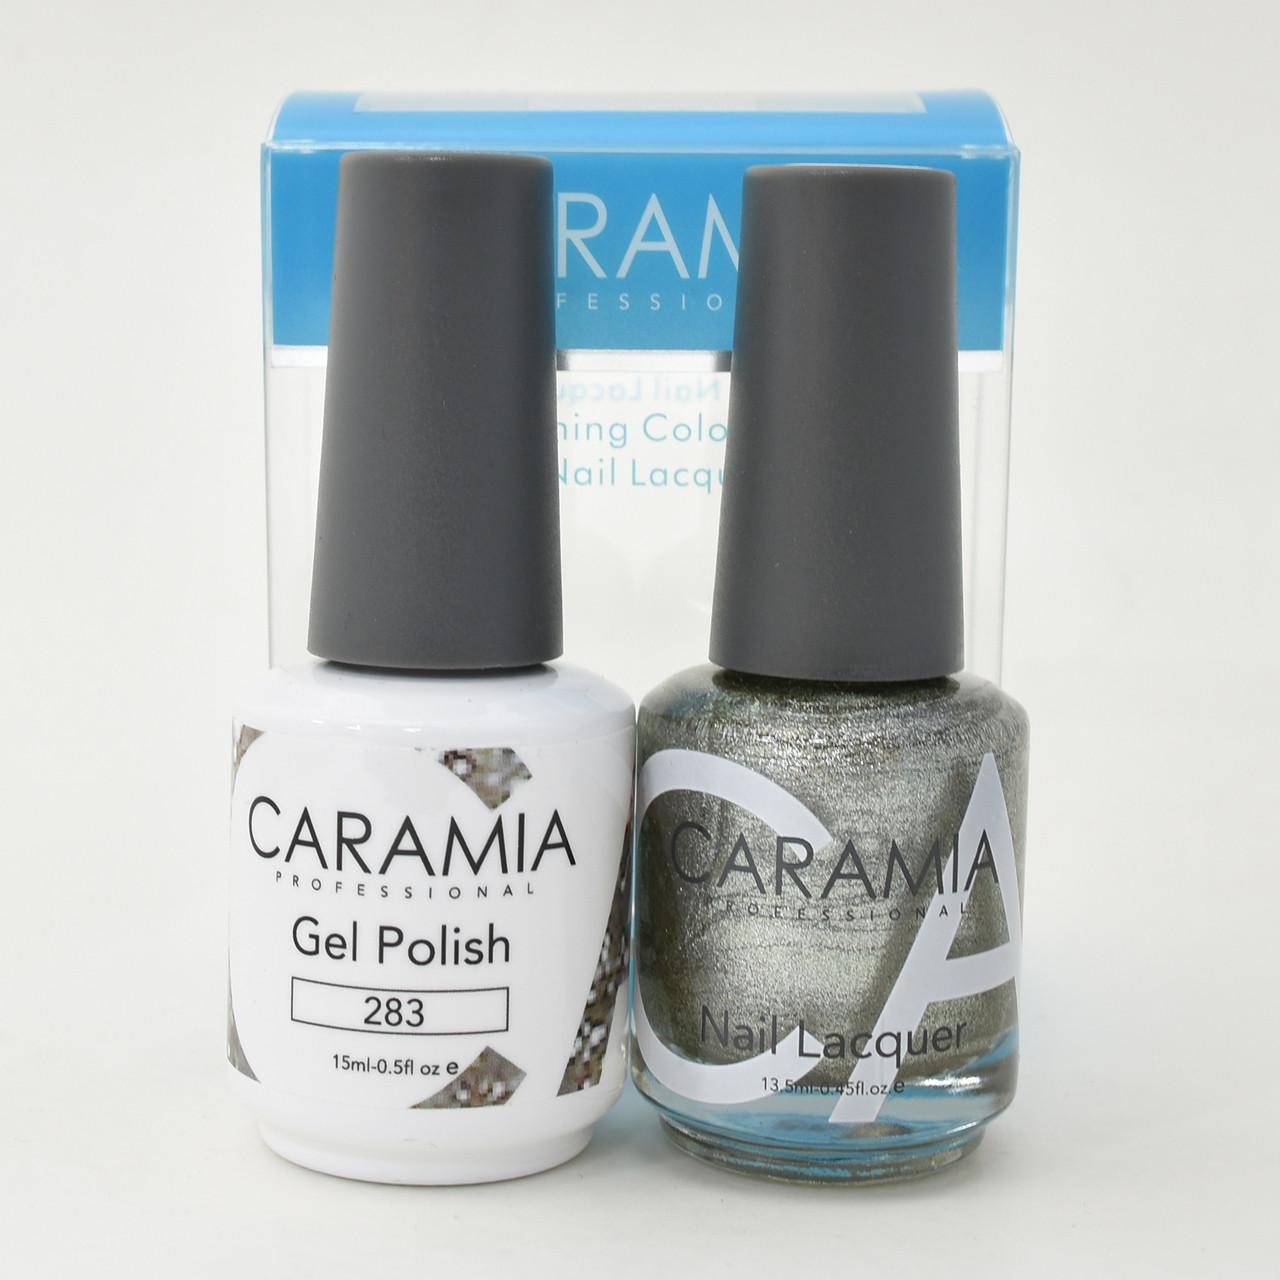 Caramia Gel Polish 15 mL & Nail Lacquer 13.5 mL Color 283 - Home ...